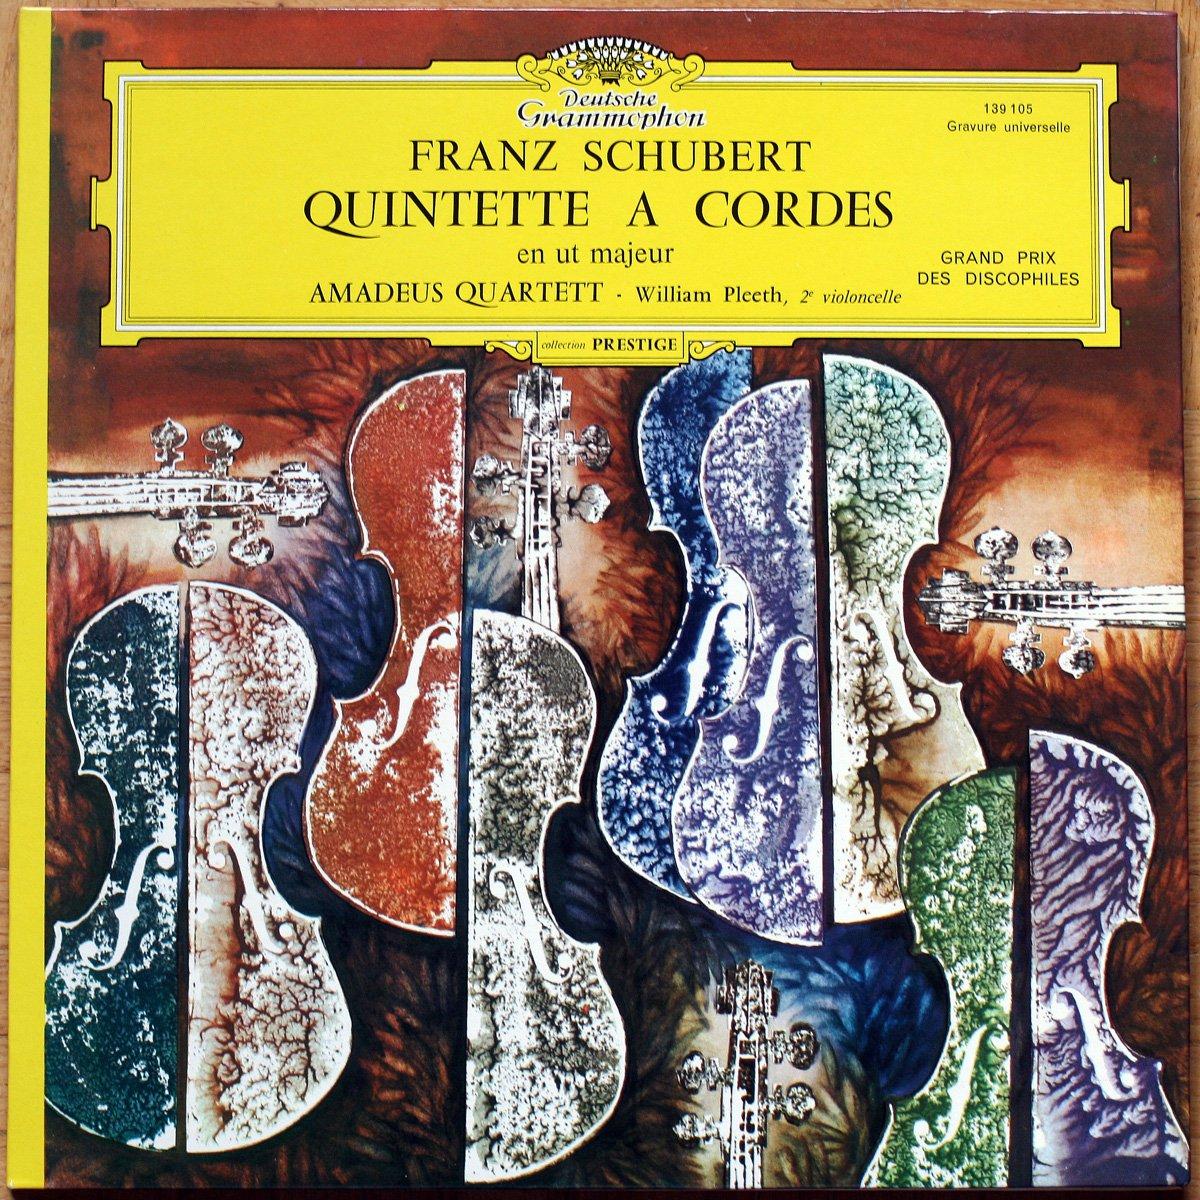 Schubert Streichquintett C-dur Quintette à cordes en Ut Majeur D. 956 DGG 139 105 William Pleeth Amadeus Quartett